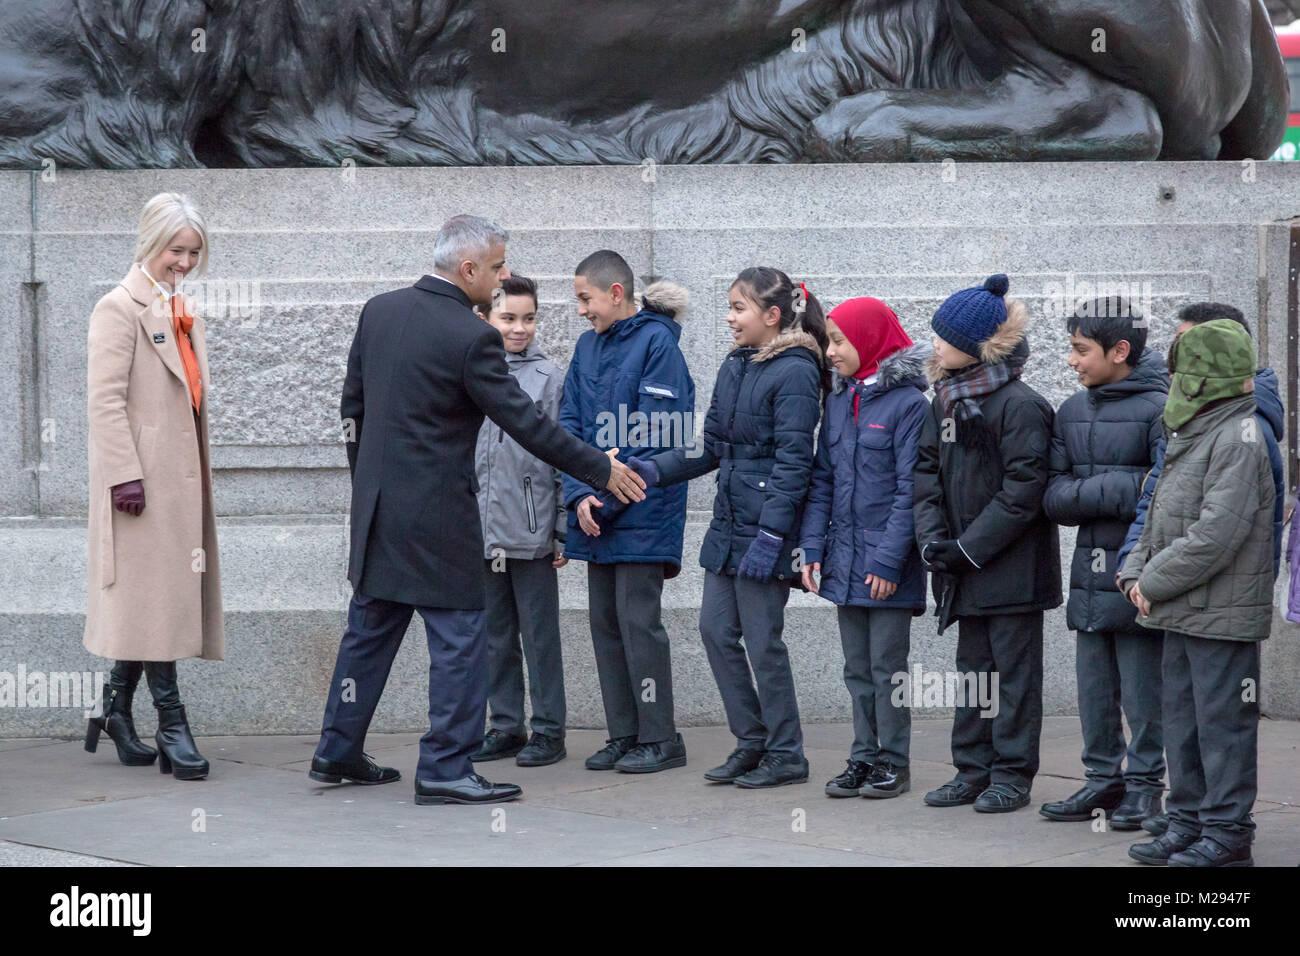 London, UK. 6th Feb, 2018. The Mayor of London hosts a symbolic exhibition in Trafalgar Square marking 100 years Stock Photo